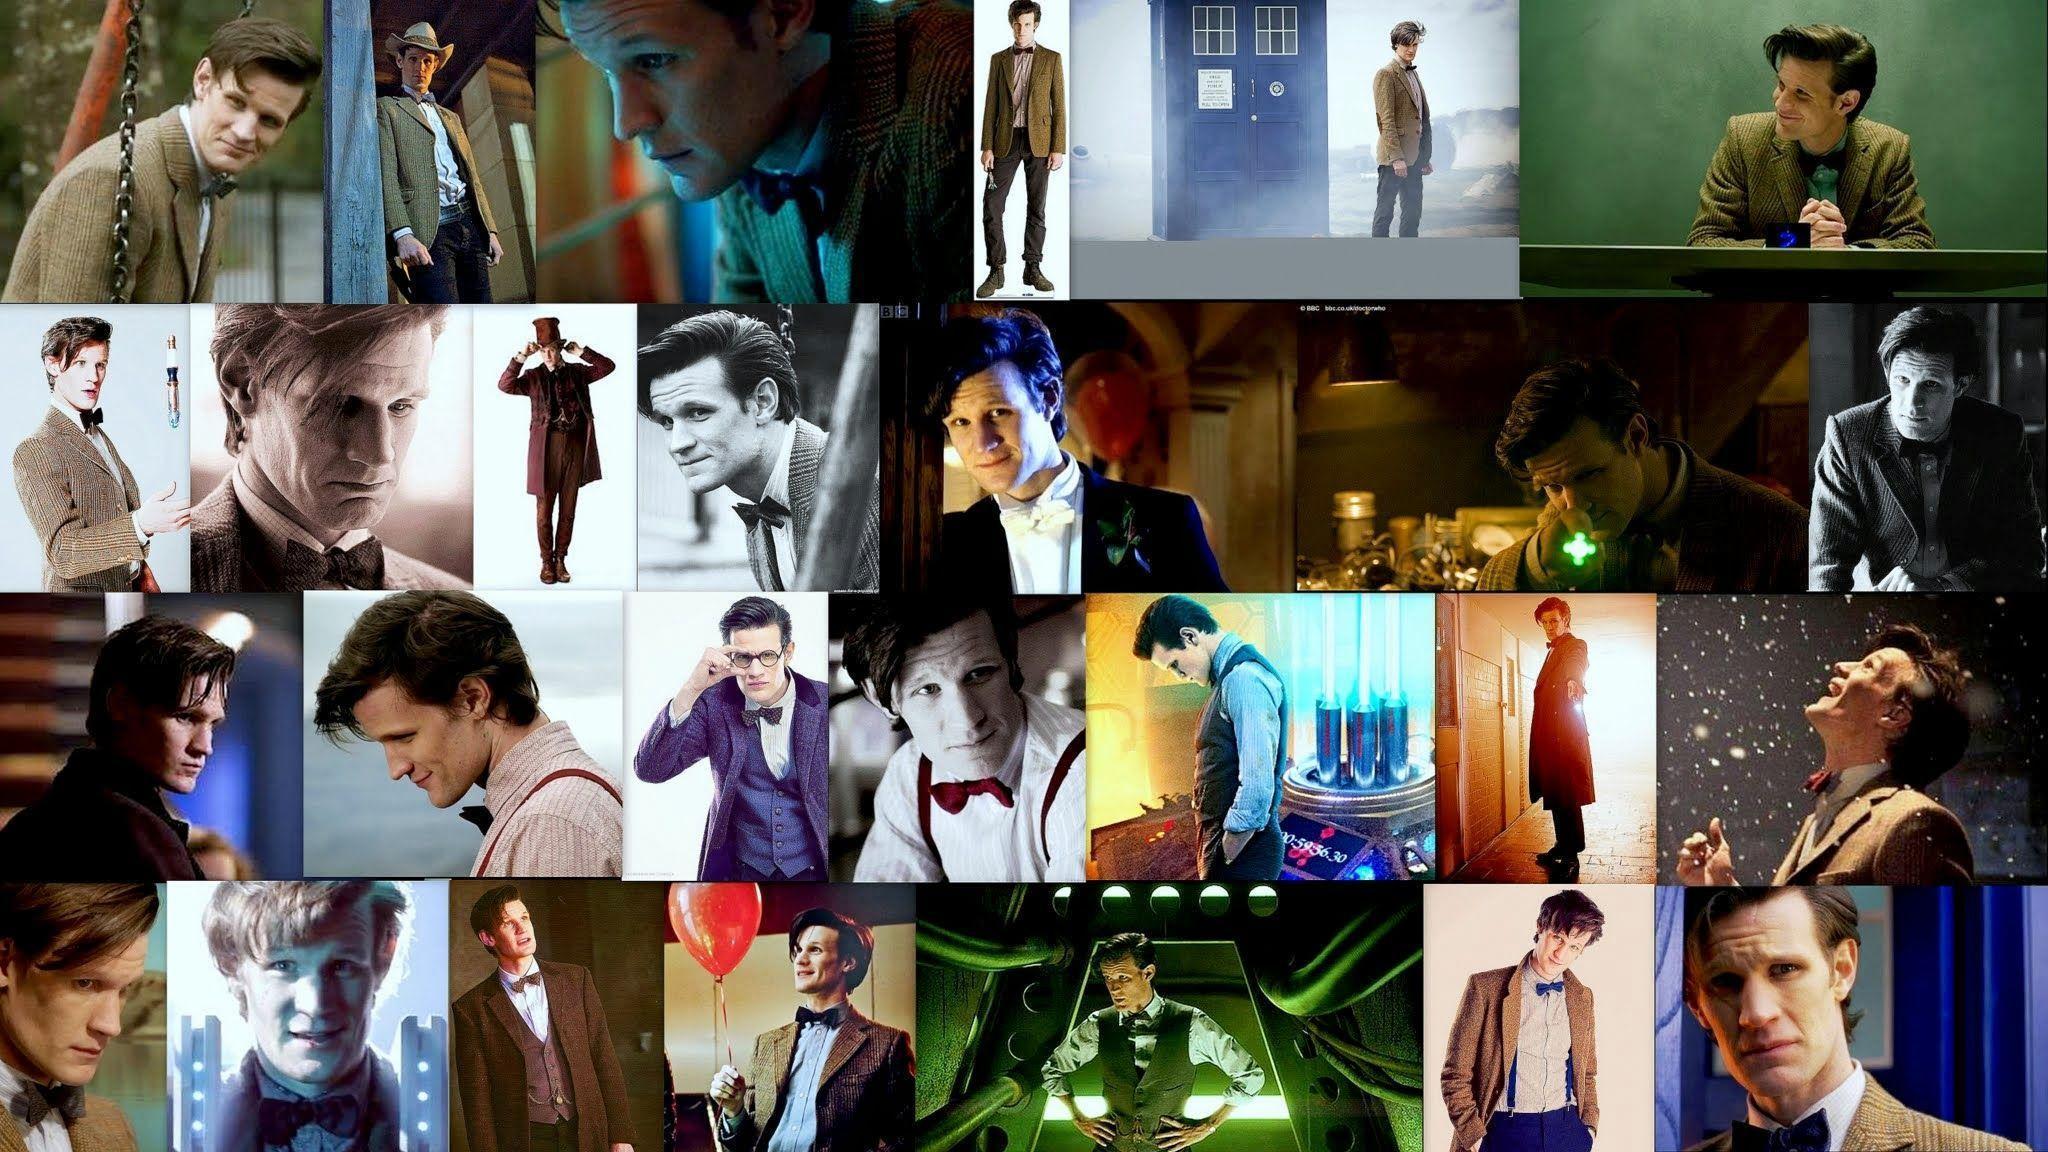 Matt Smith Doctor Who Wallpapers - Wallpaper Cave